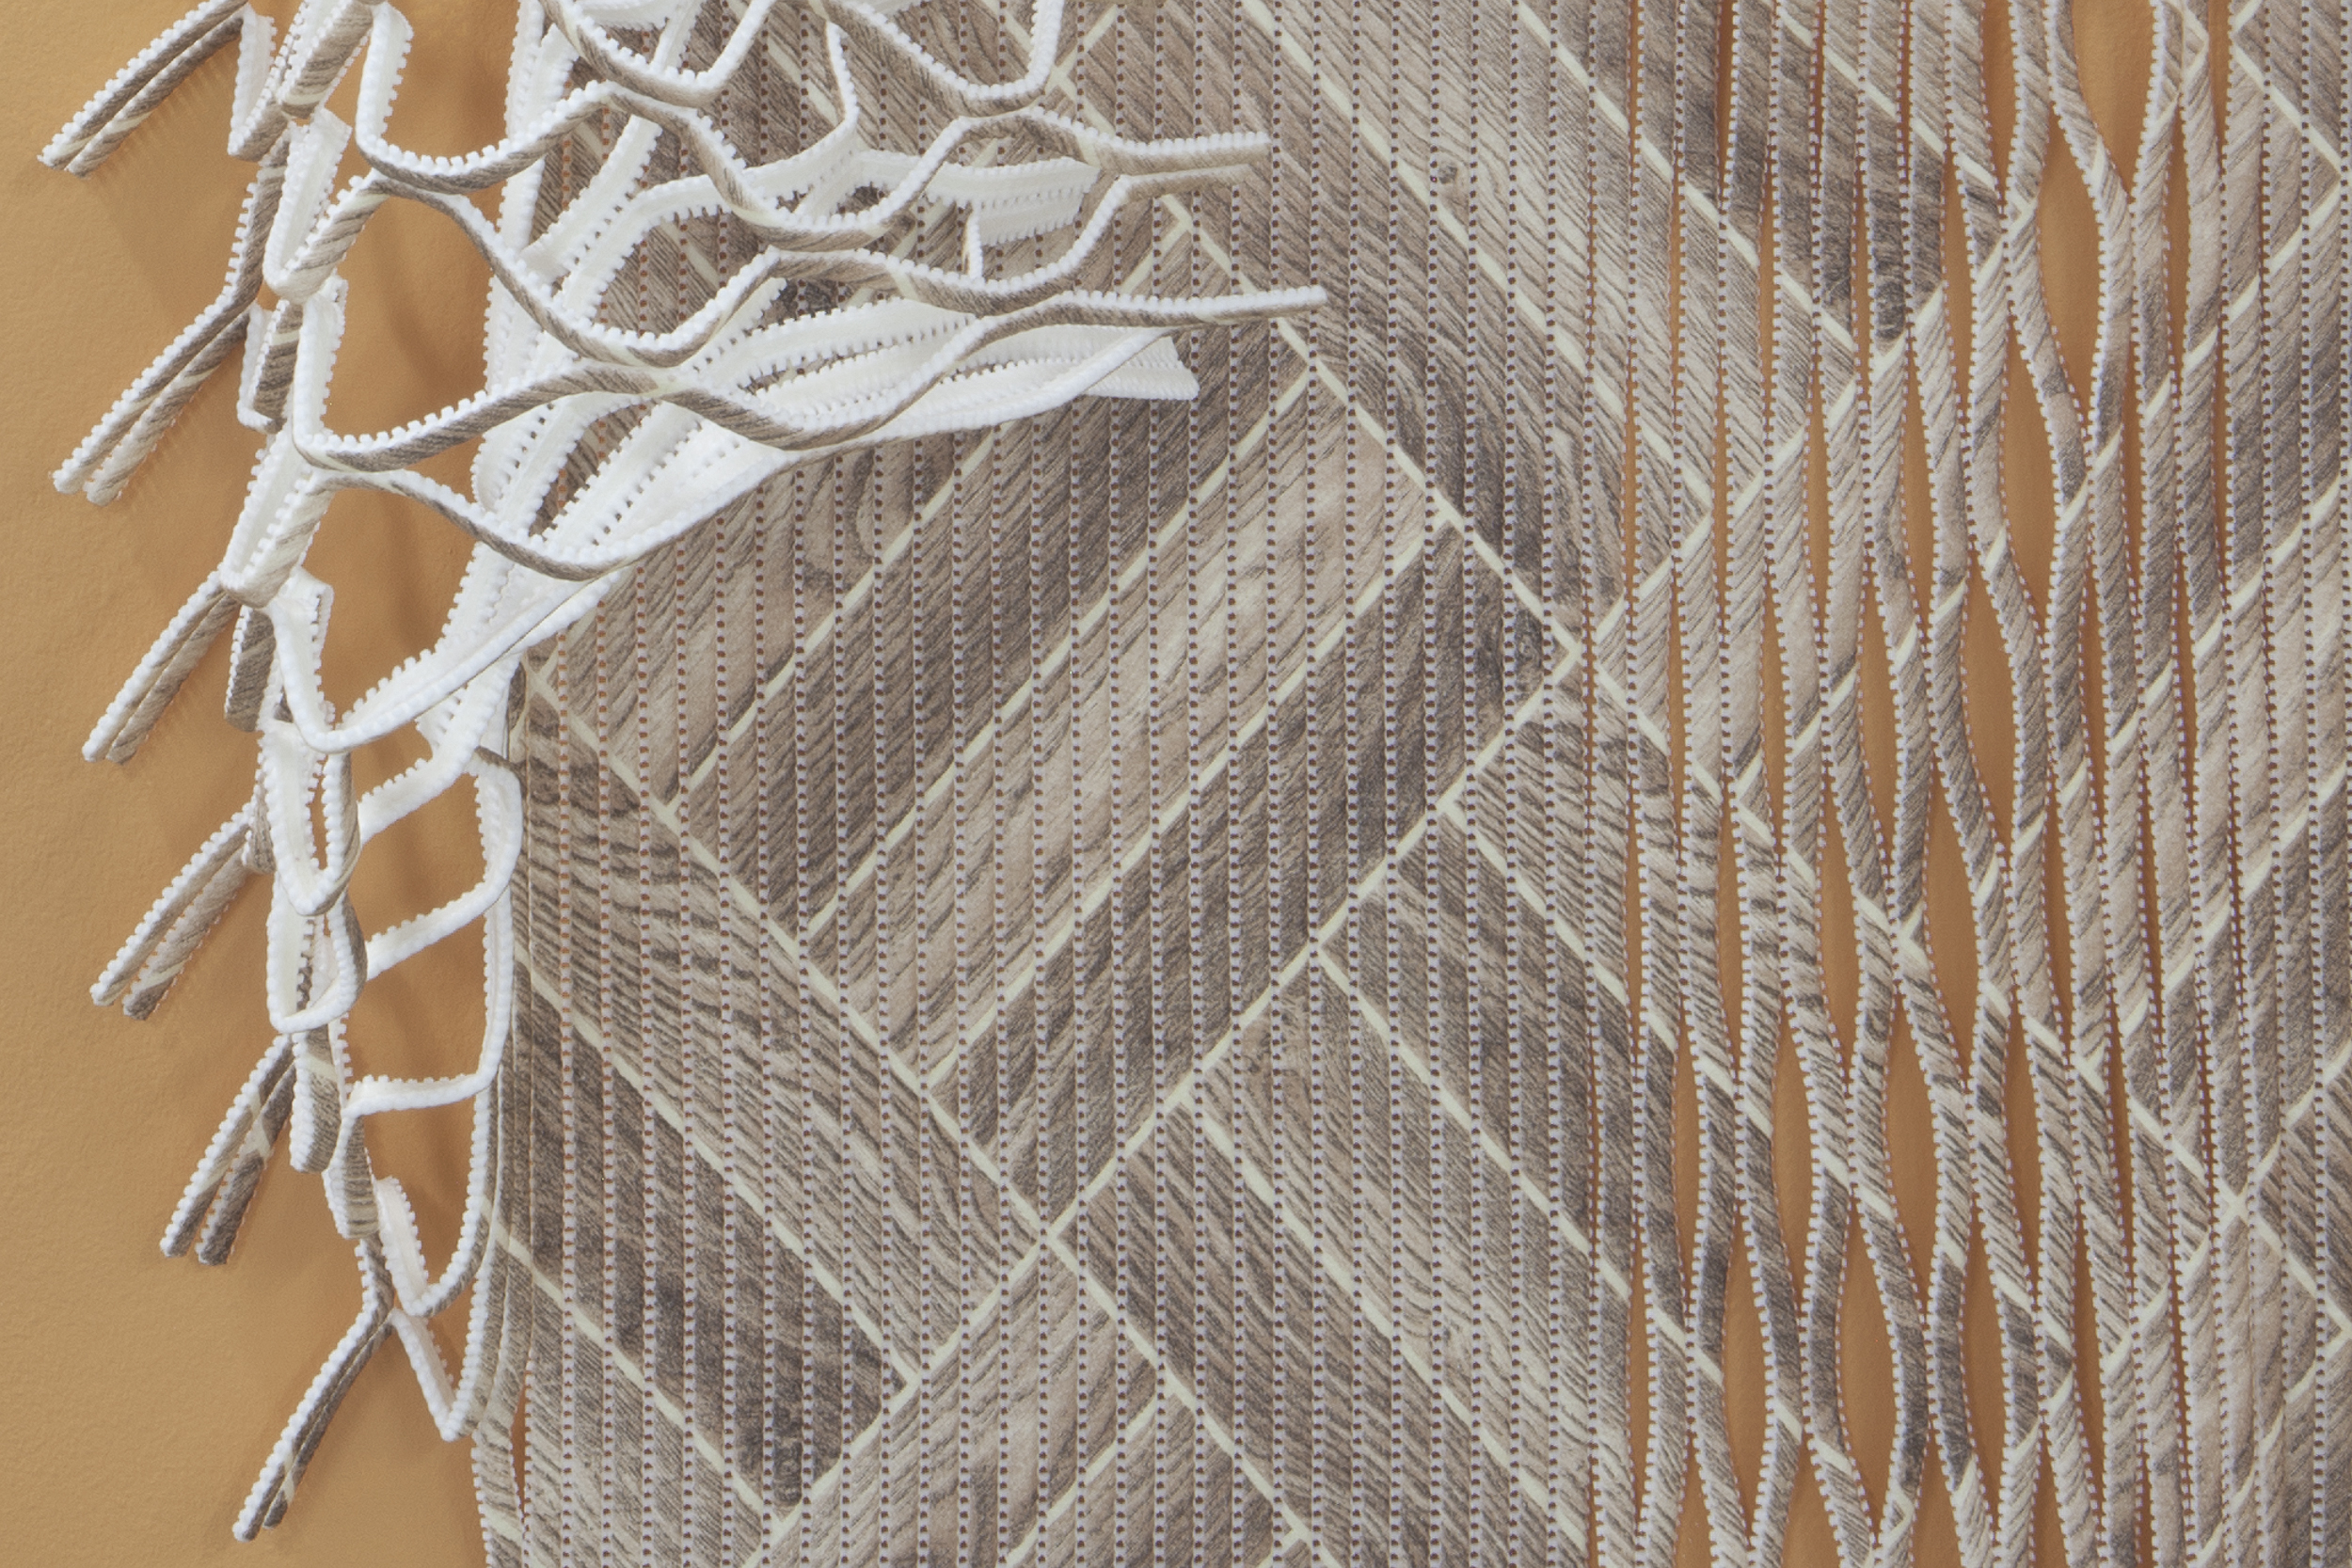 Textured vinyl cloth © Lucy Renton